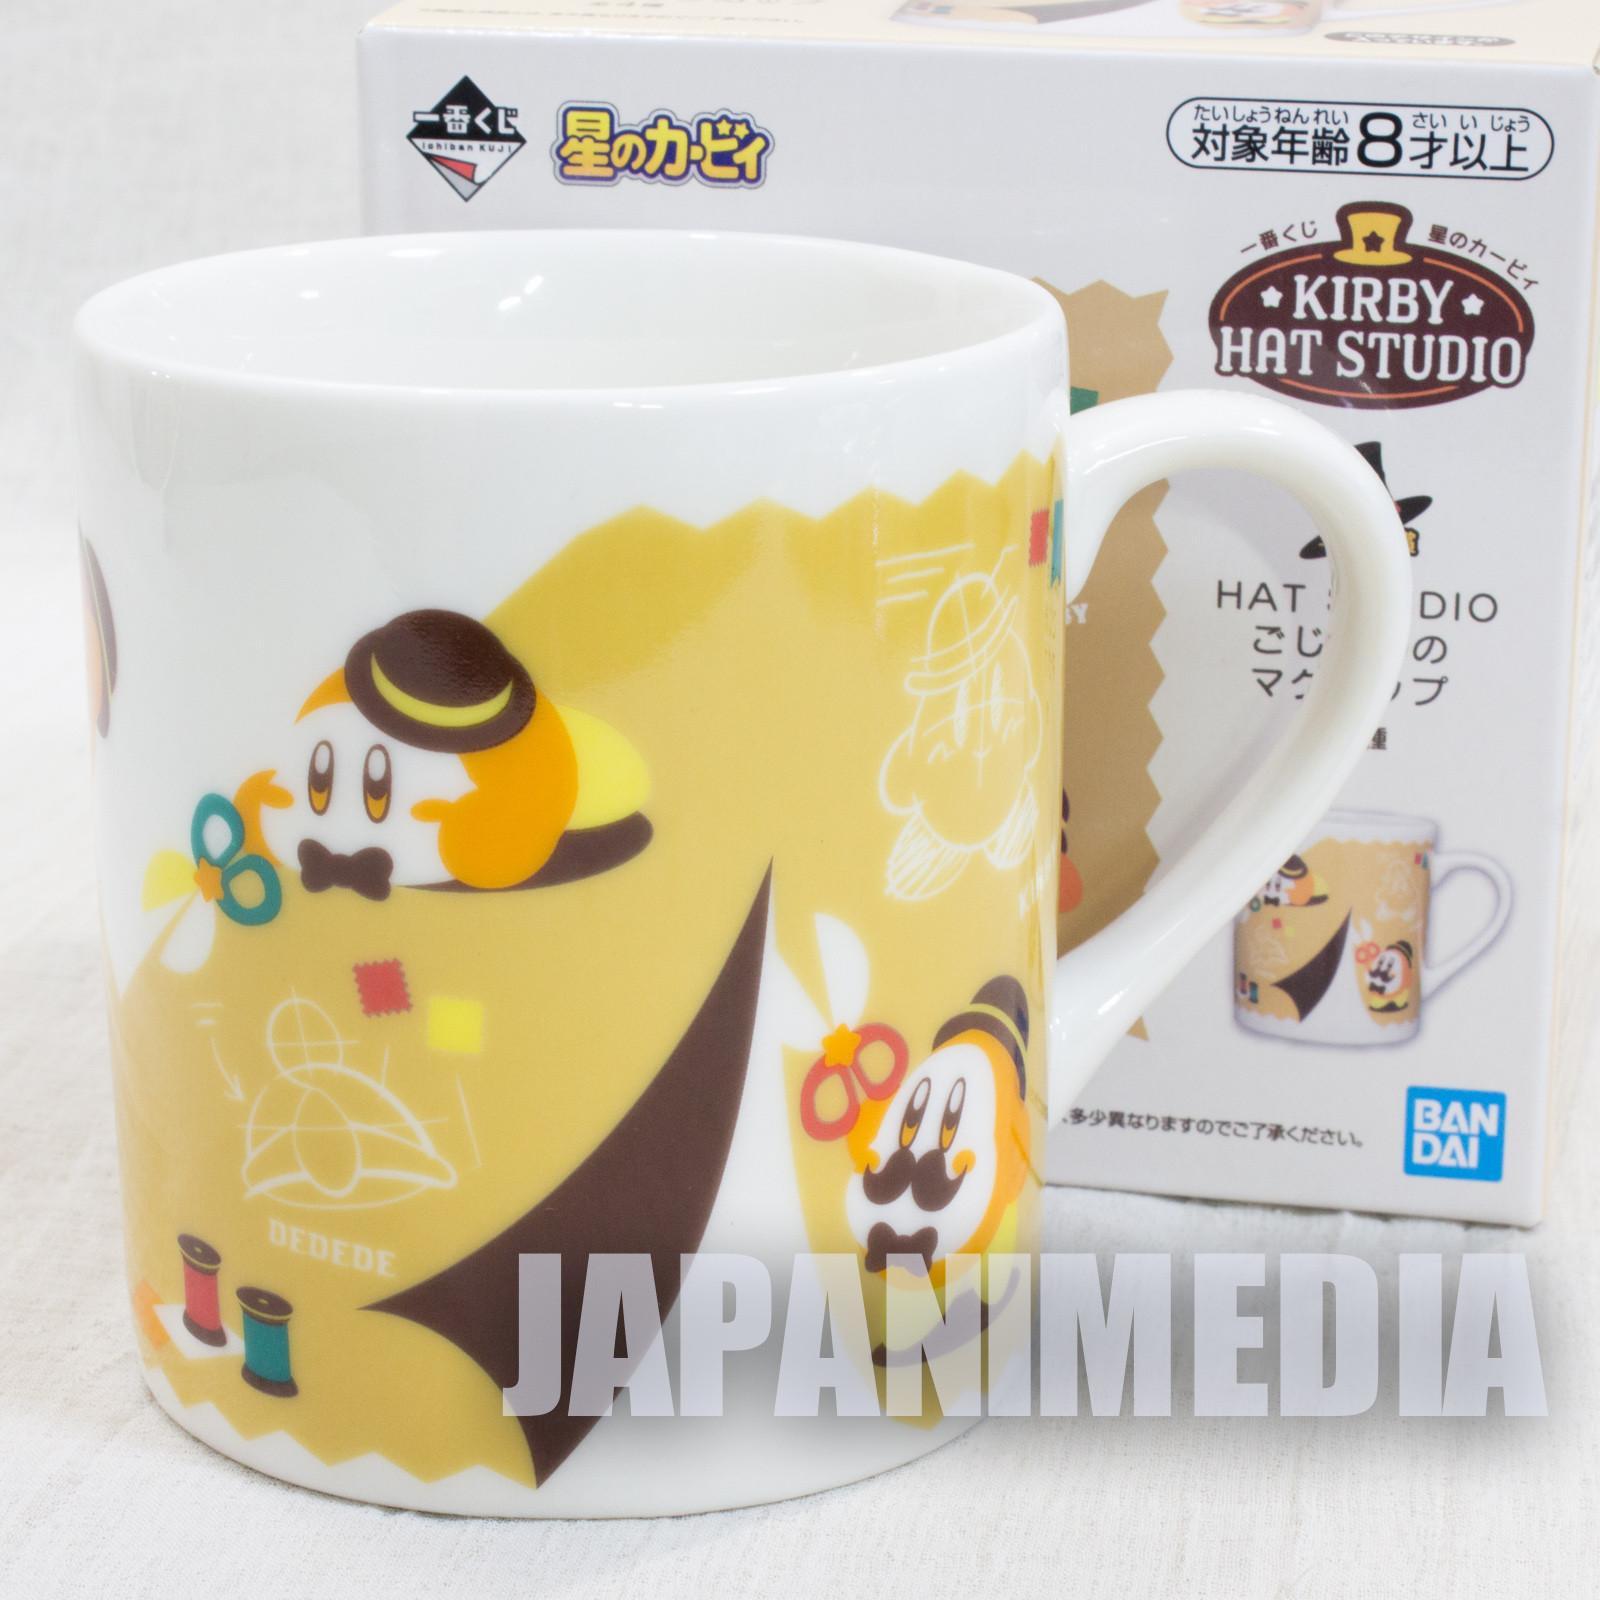 Kirby Super Star Hat Studio Mug #2 Banpresto JAPAN GAME NINTENDO